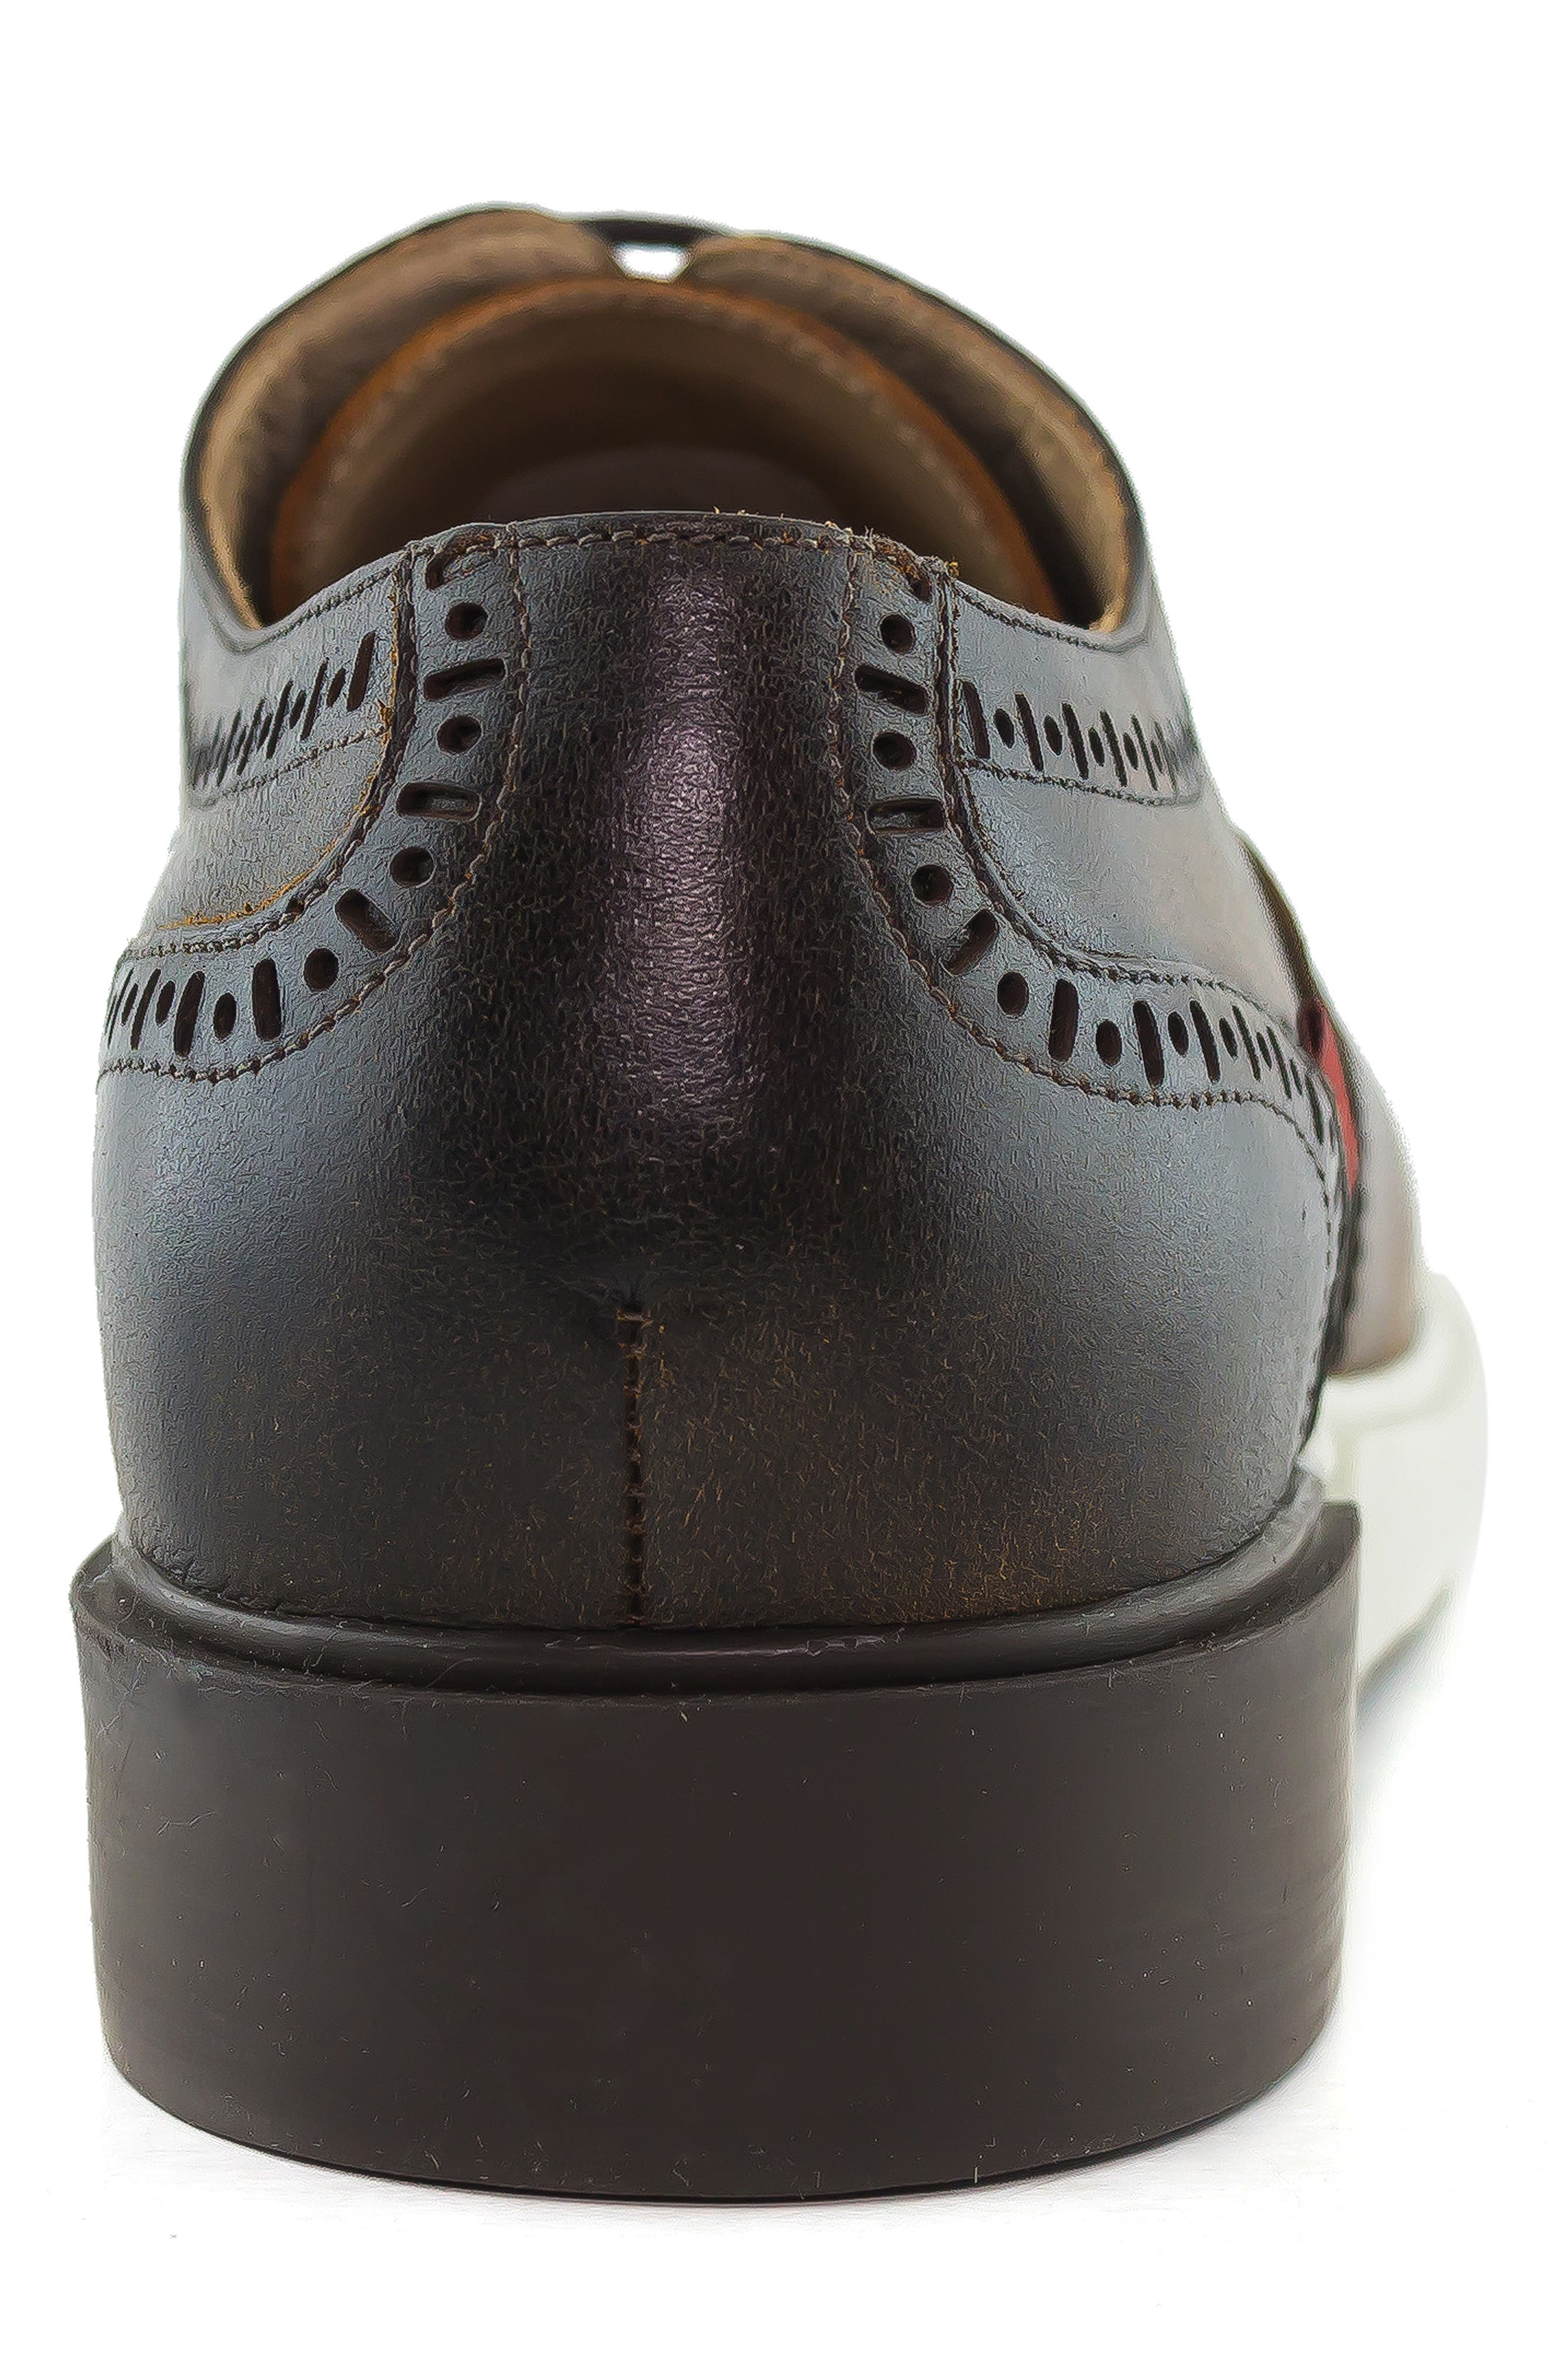 5th Ave Wingtip Sneaker,                             Alternate thumbnail 28, color,